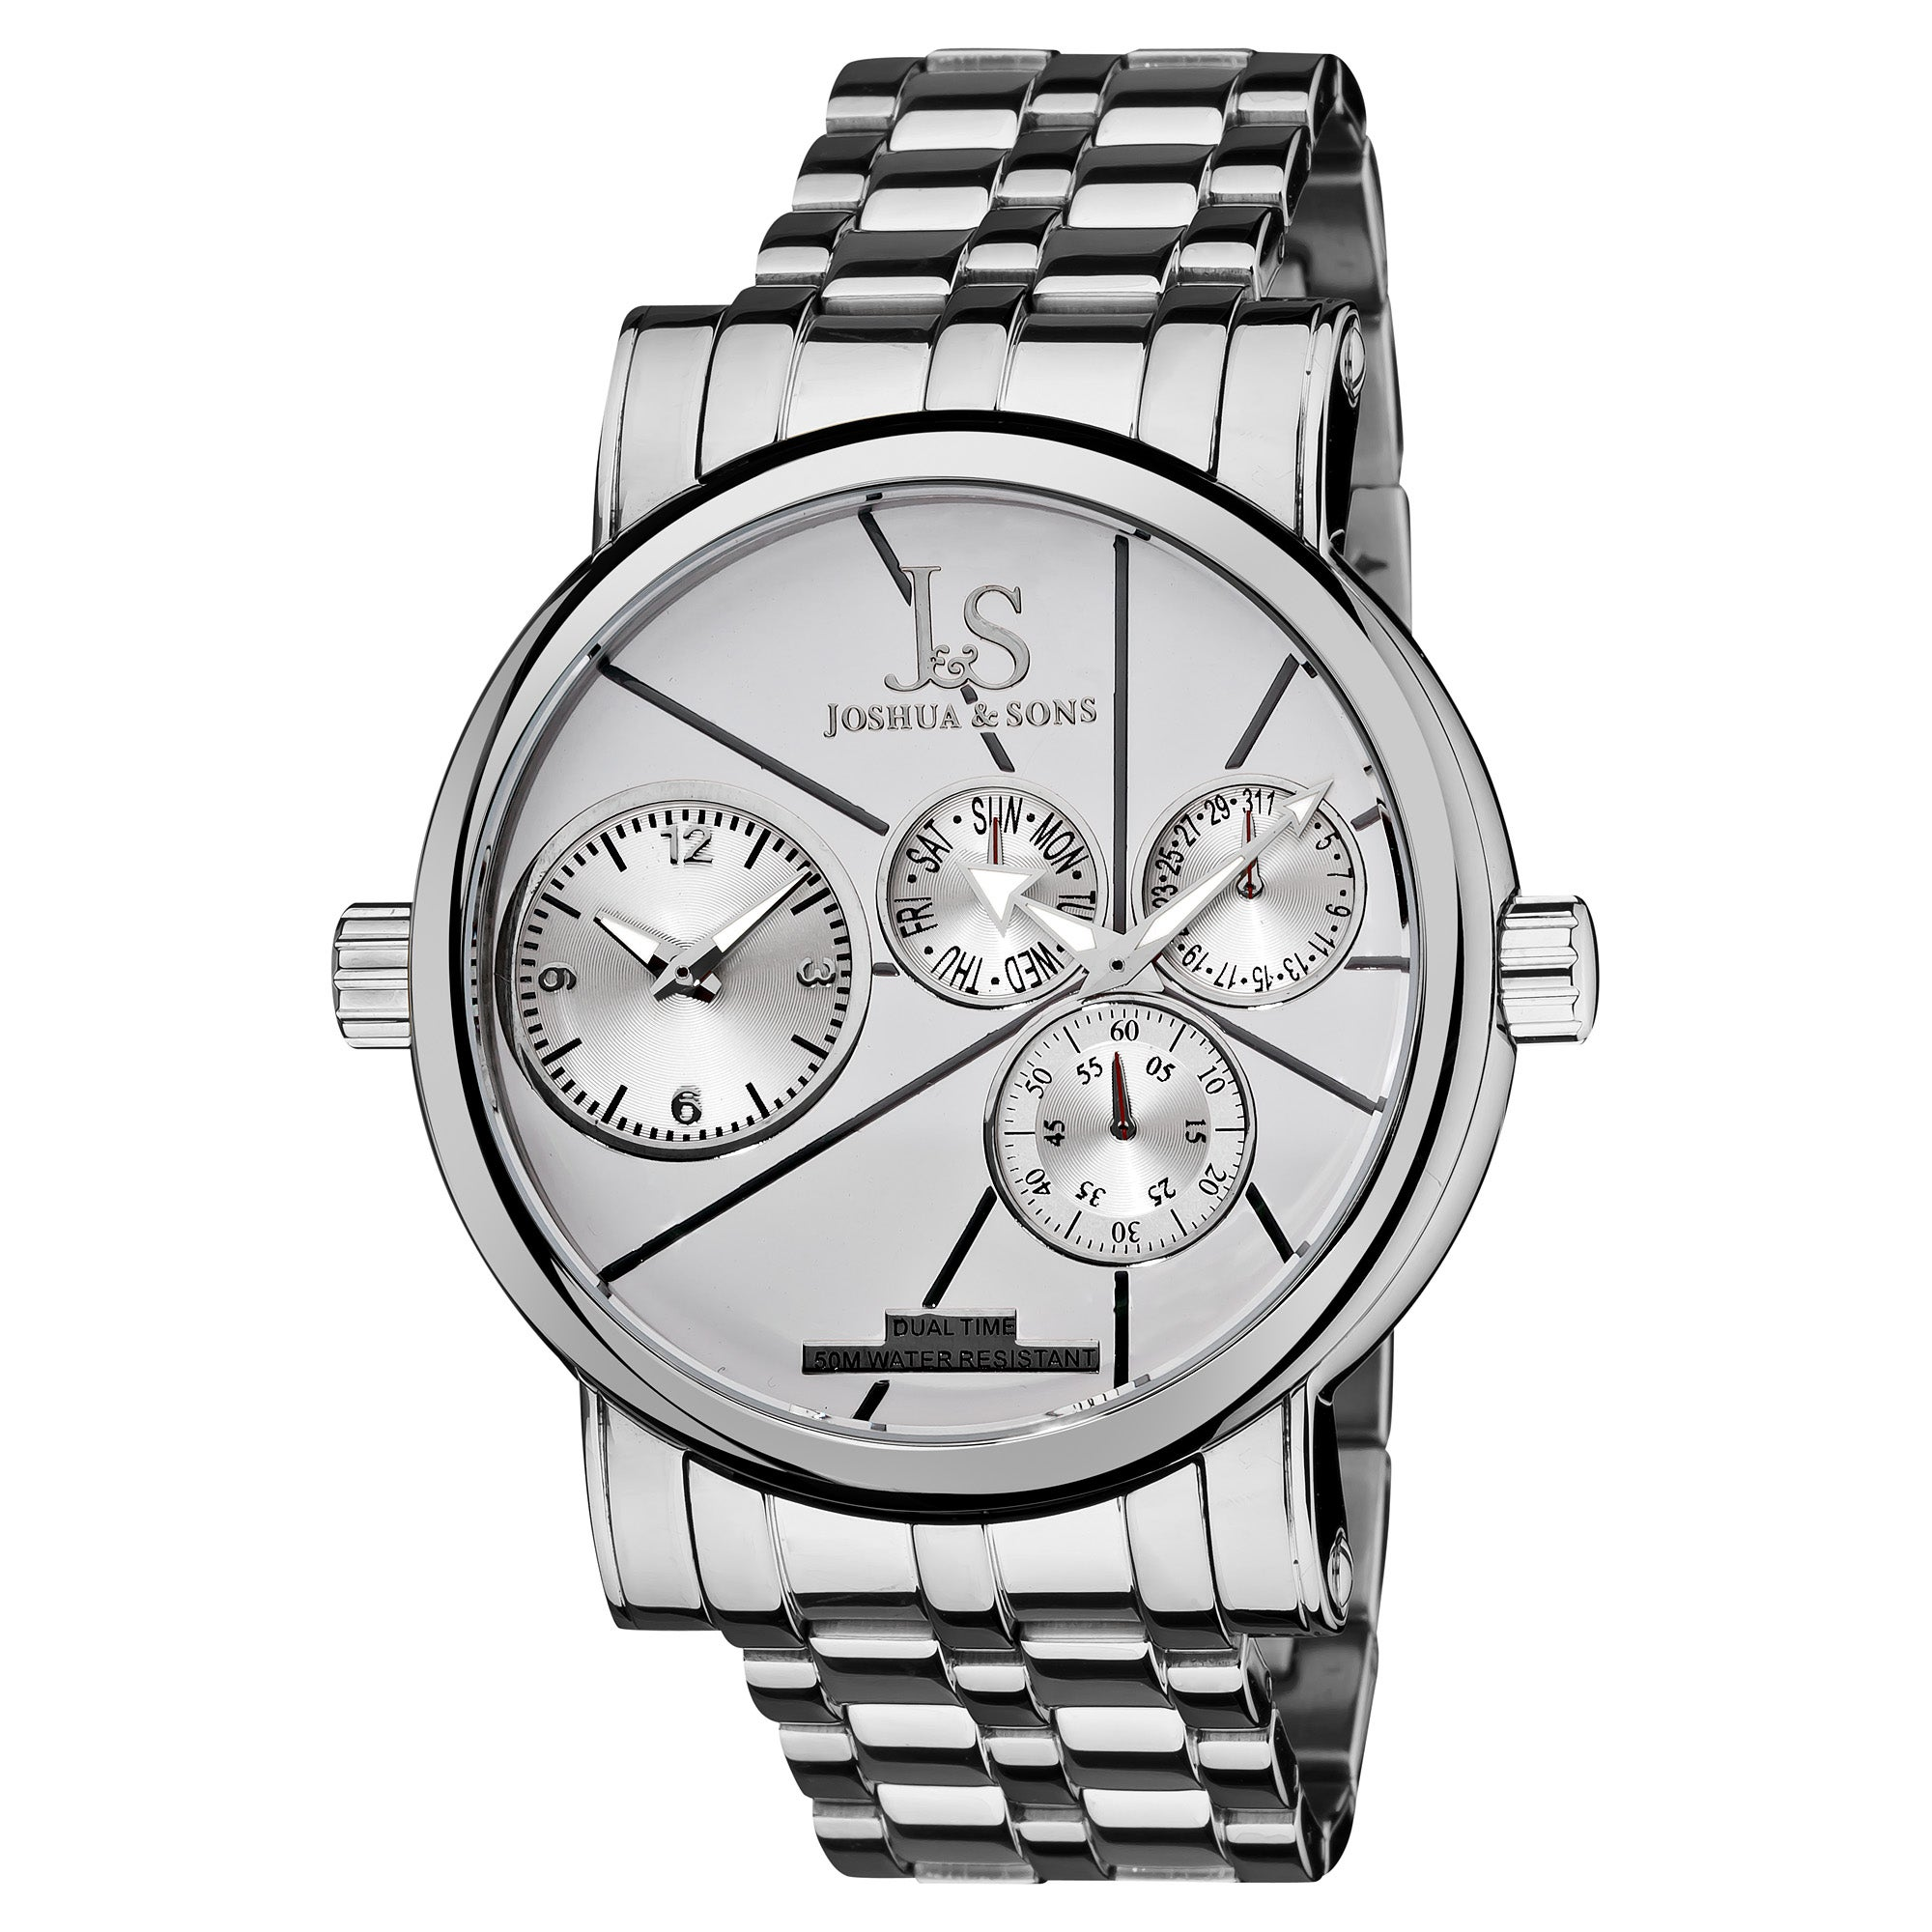 Joshua & Sons Men's Dual-time Stainless Steel Quartz Watch